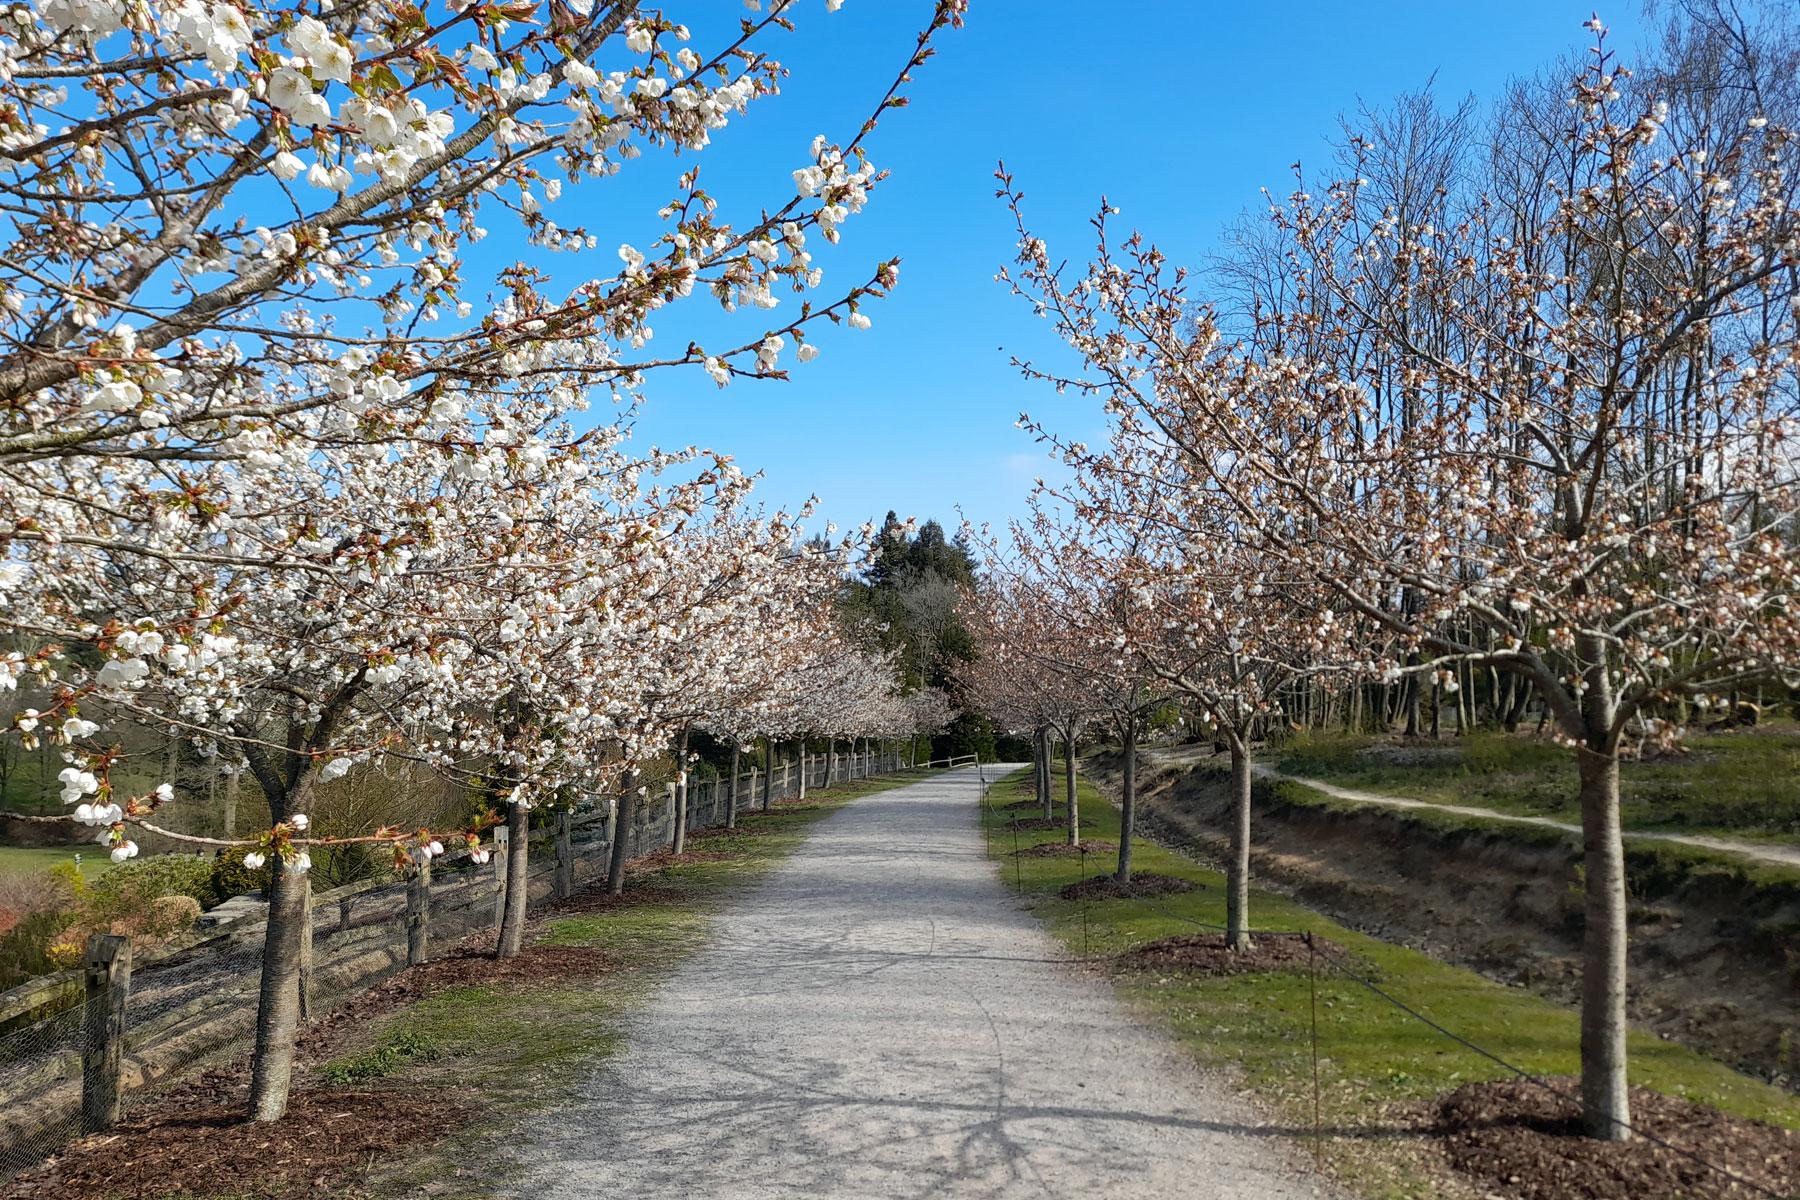 Bedgebury Cherry Blossom